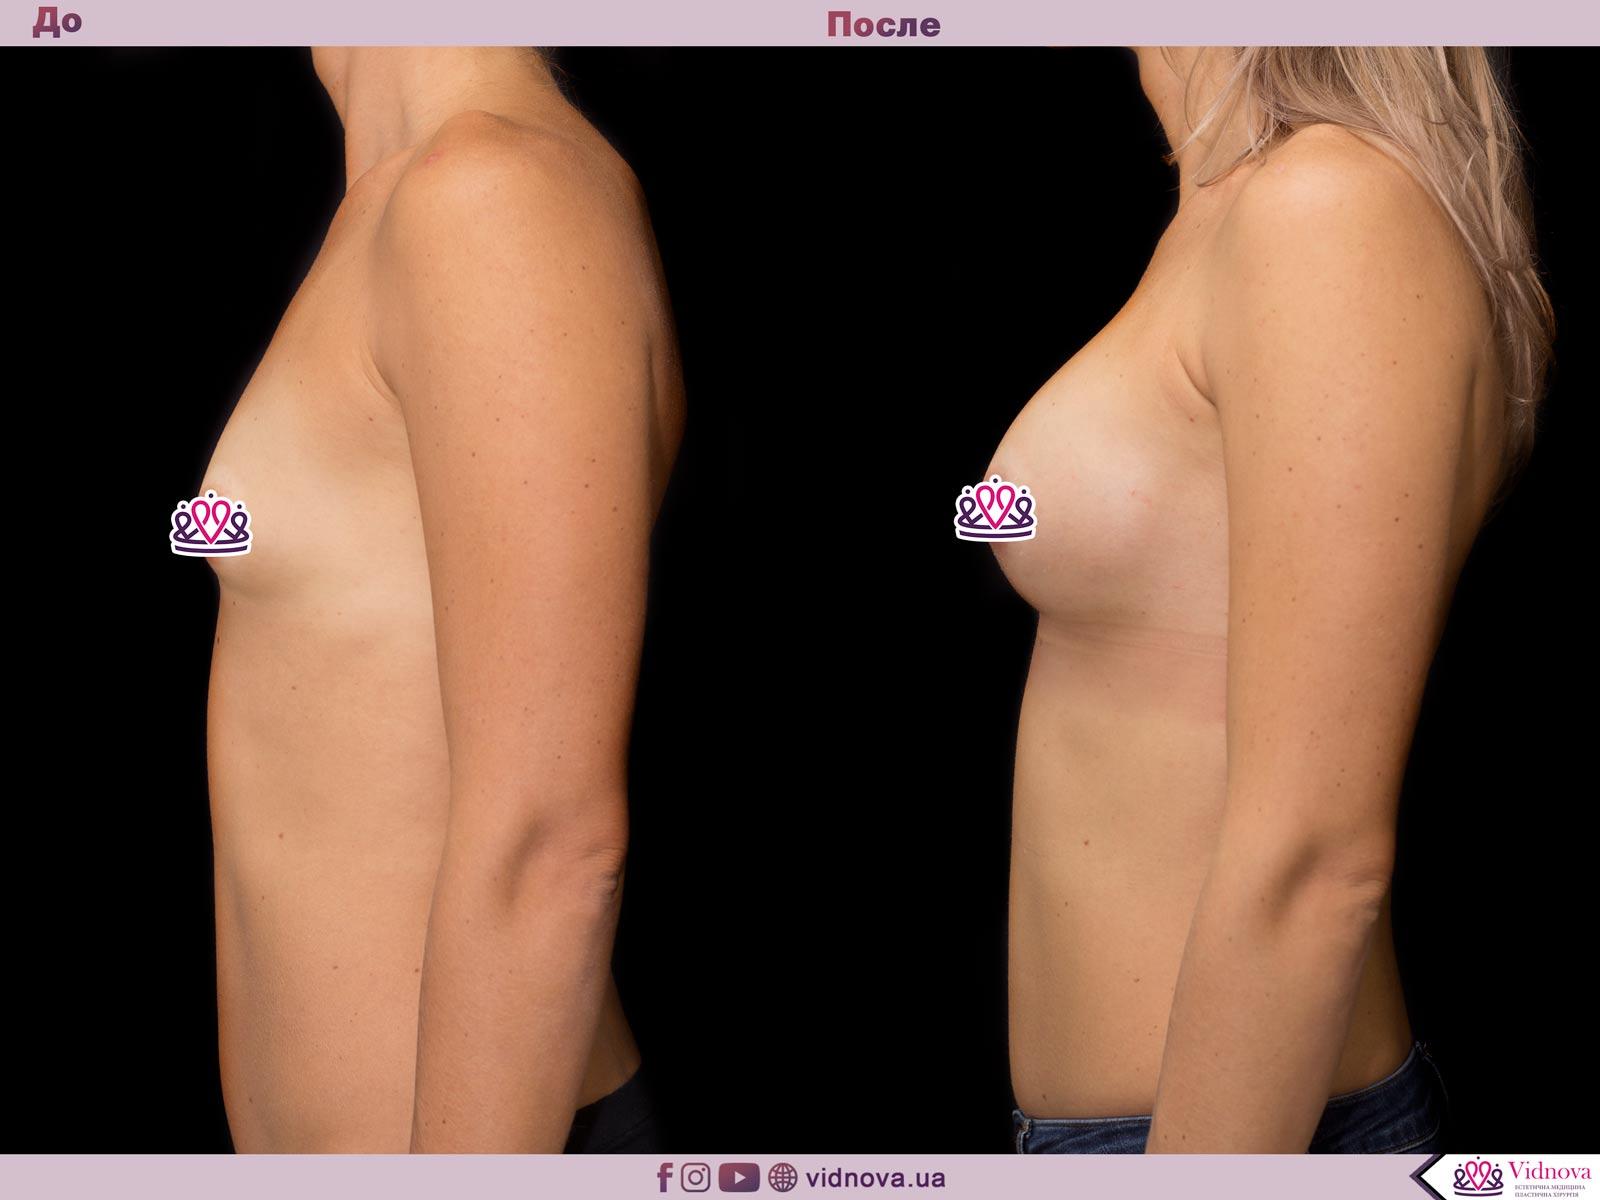 Увеличение груди: Фото ДО и ПОСЛЕ - Пример №46-3 - Клиника Vidnova